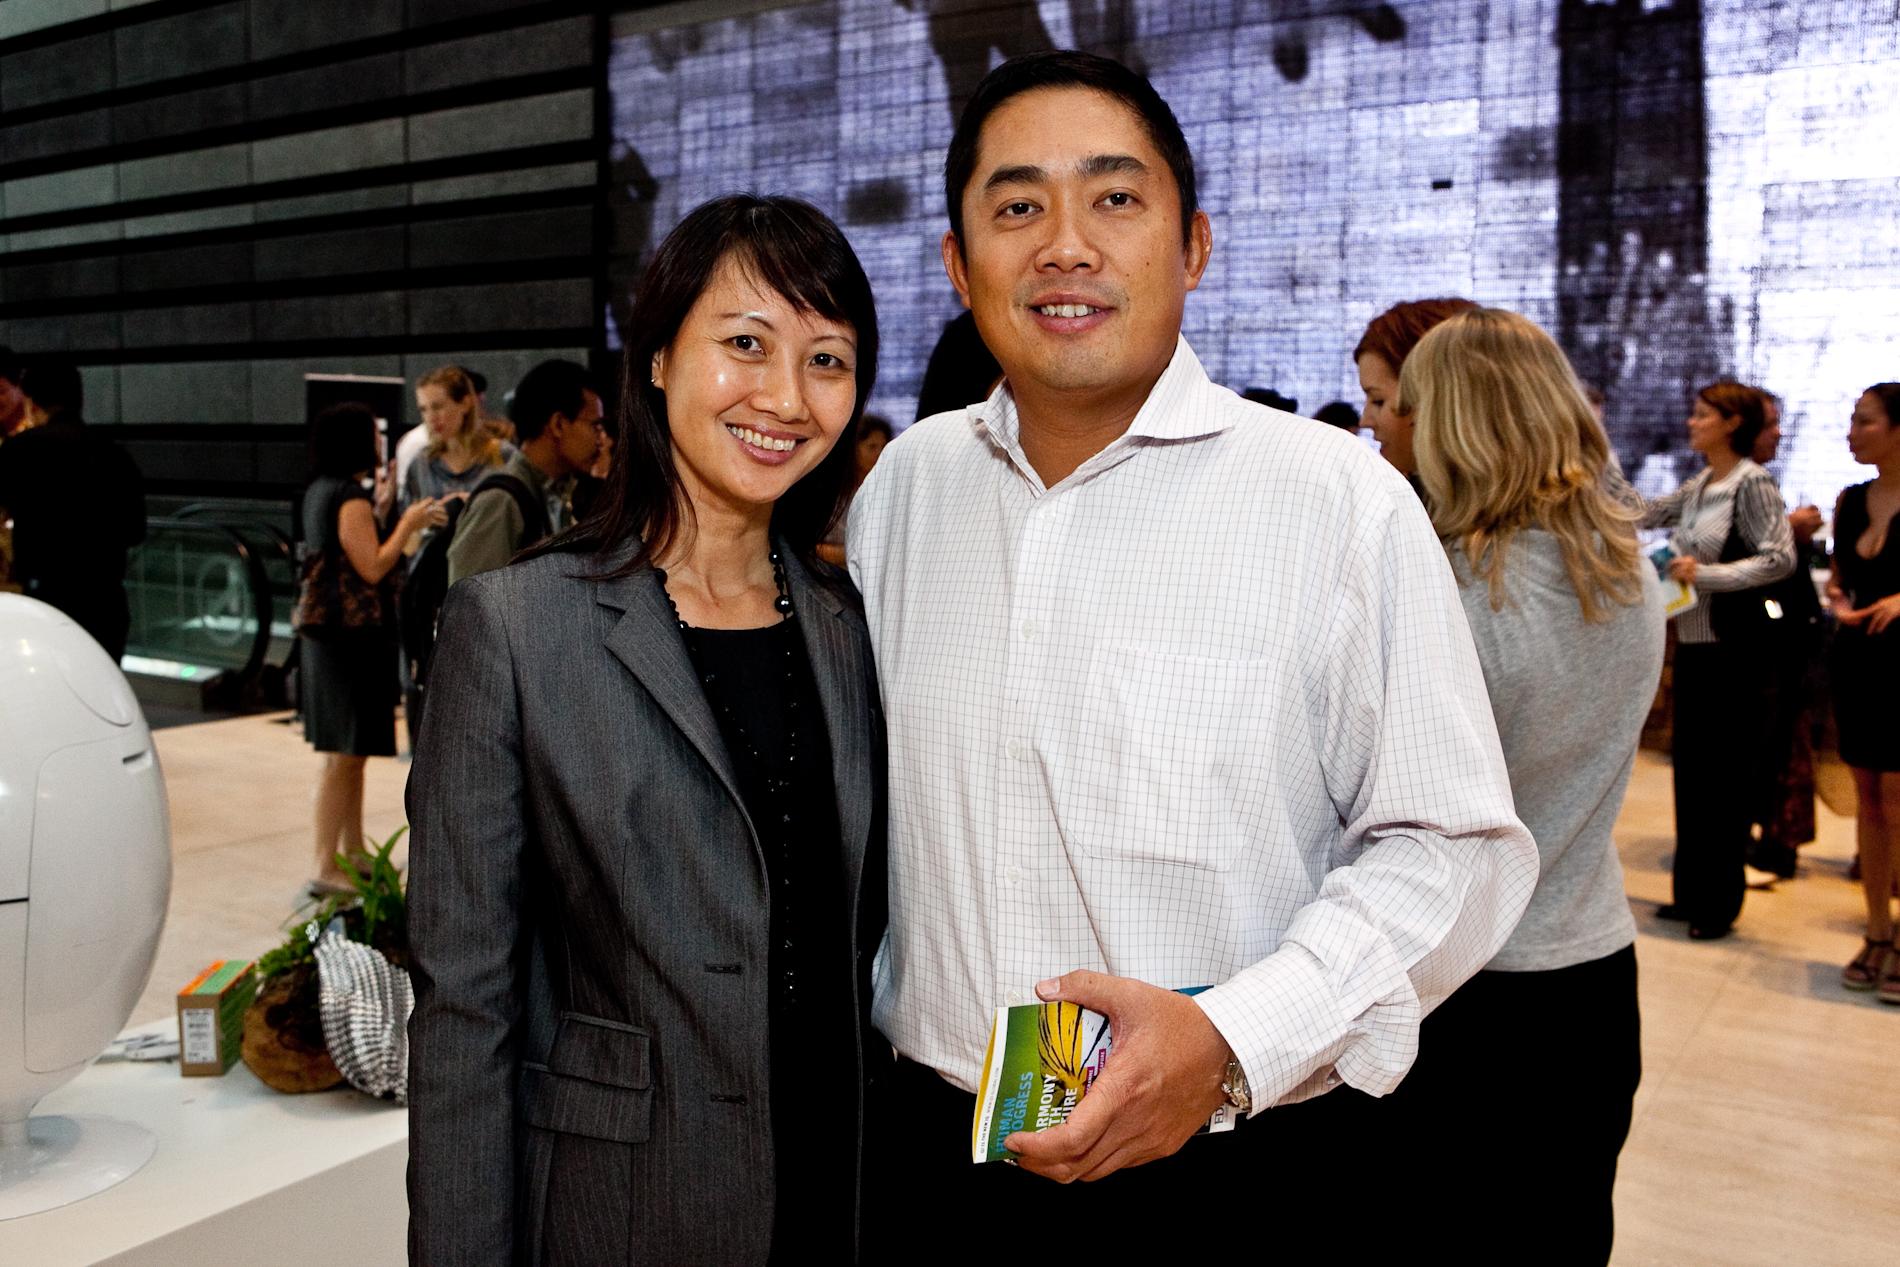 qi-global-2009-sustaible-design-singapore-062.jpg